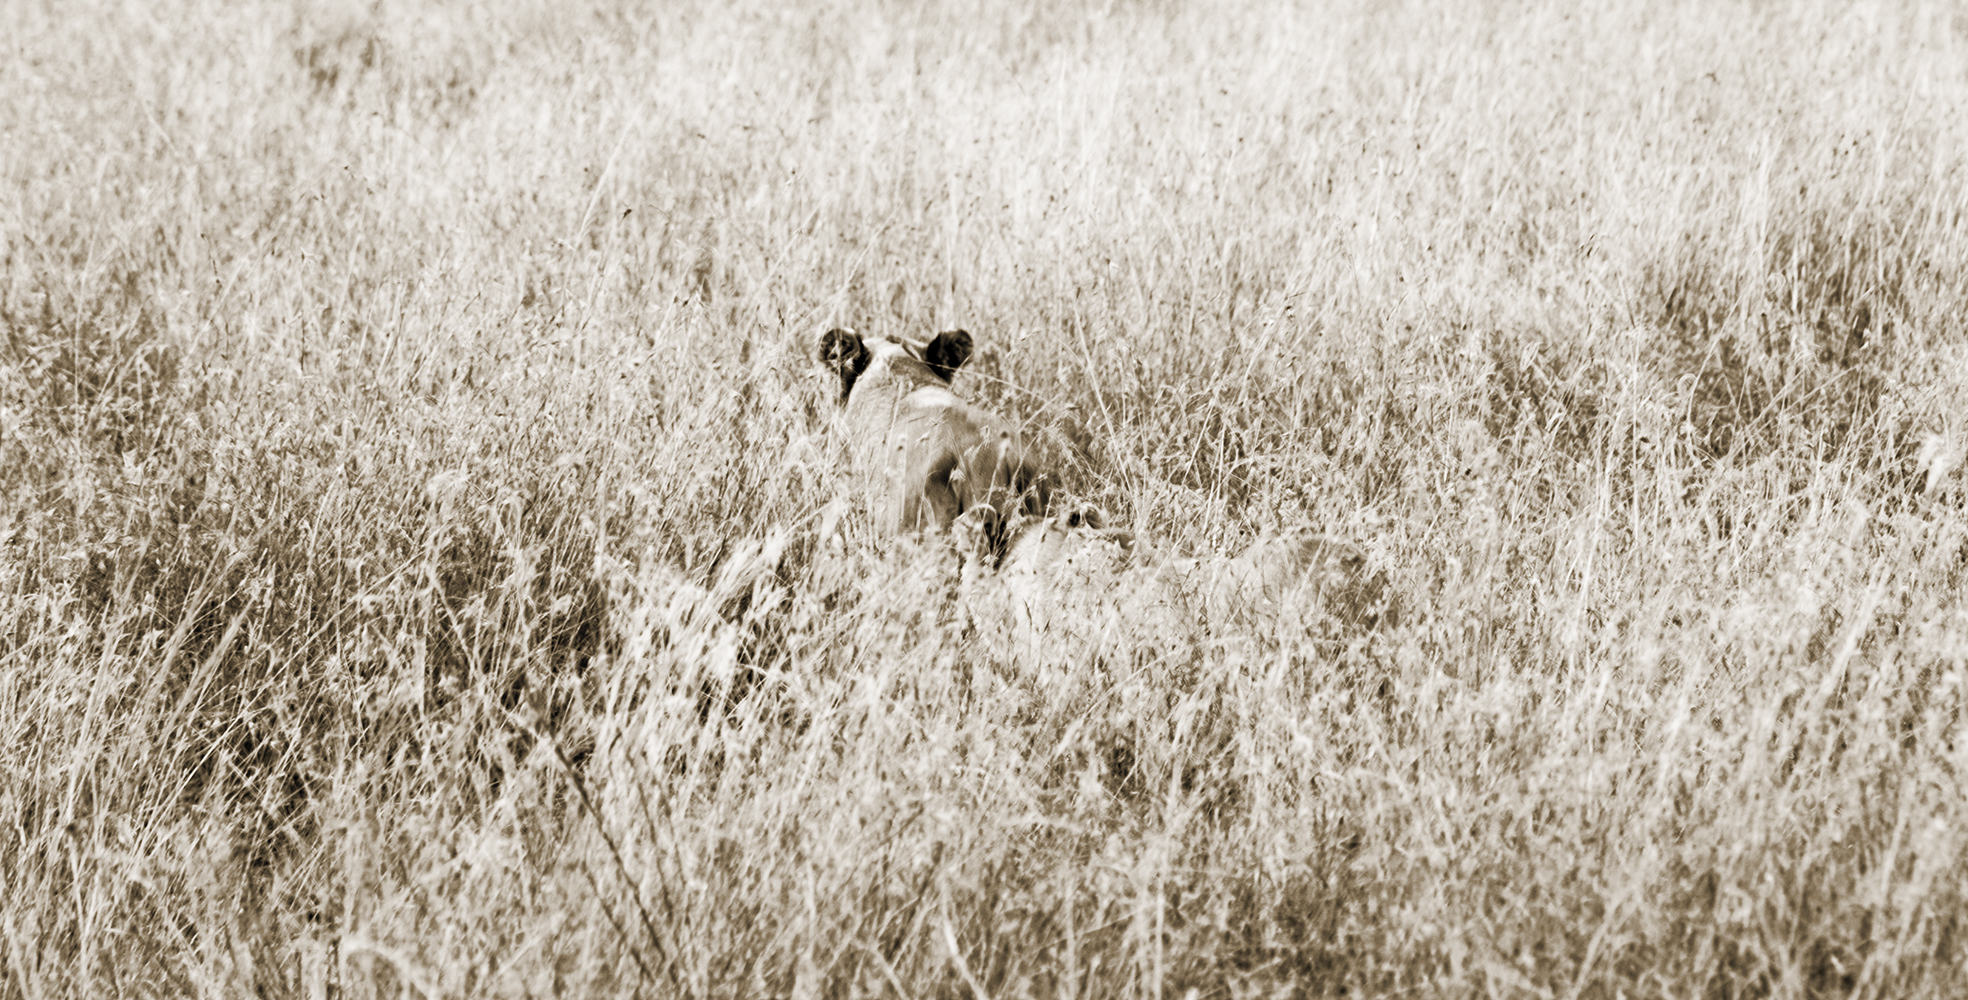 Lions17BWSmall.jpg